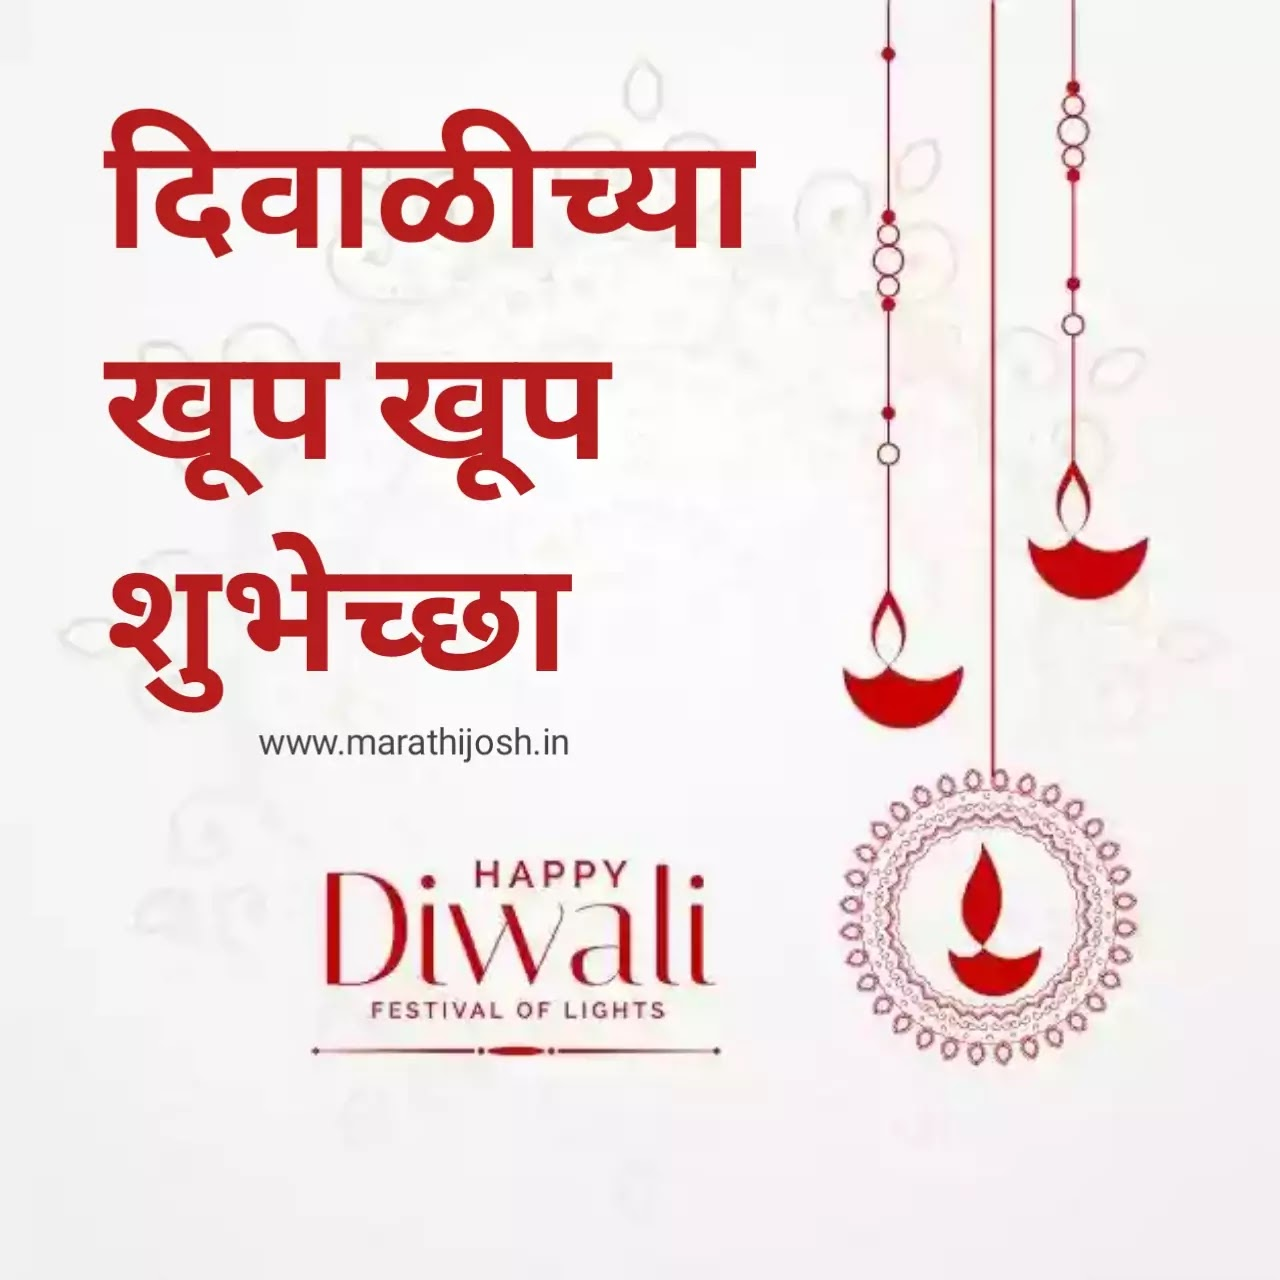 Diwali Shubhechha Marathi